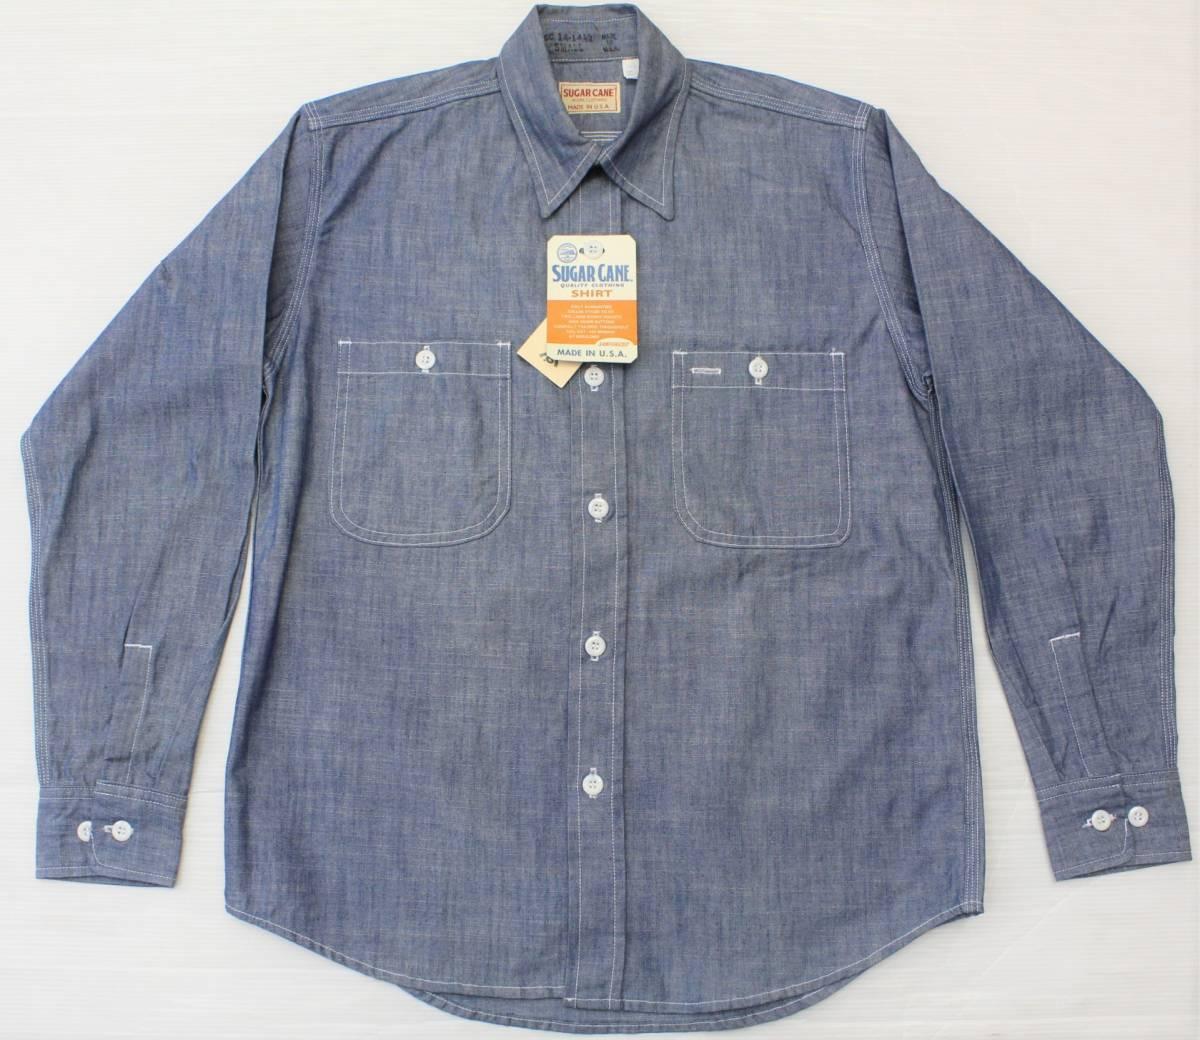 YSL73東洋SシュガーケーンUSA製 シャンブレー ワークシャツ3本針 防縮加工 長袖シャツSUGAR CANE_画像1